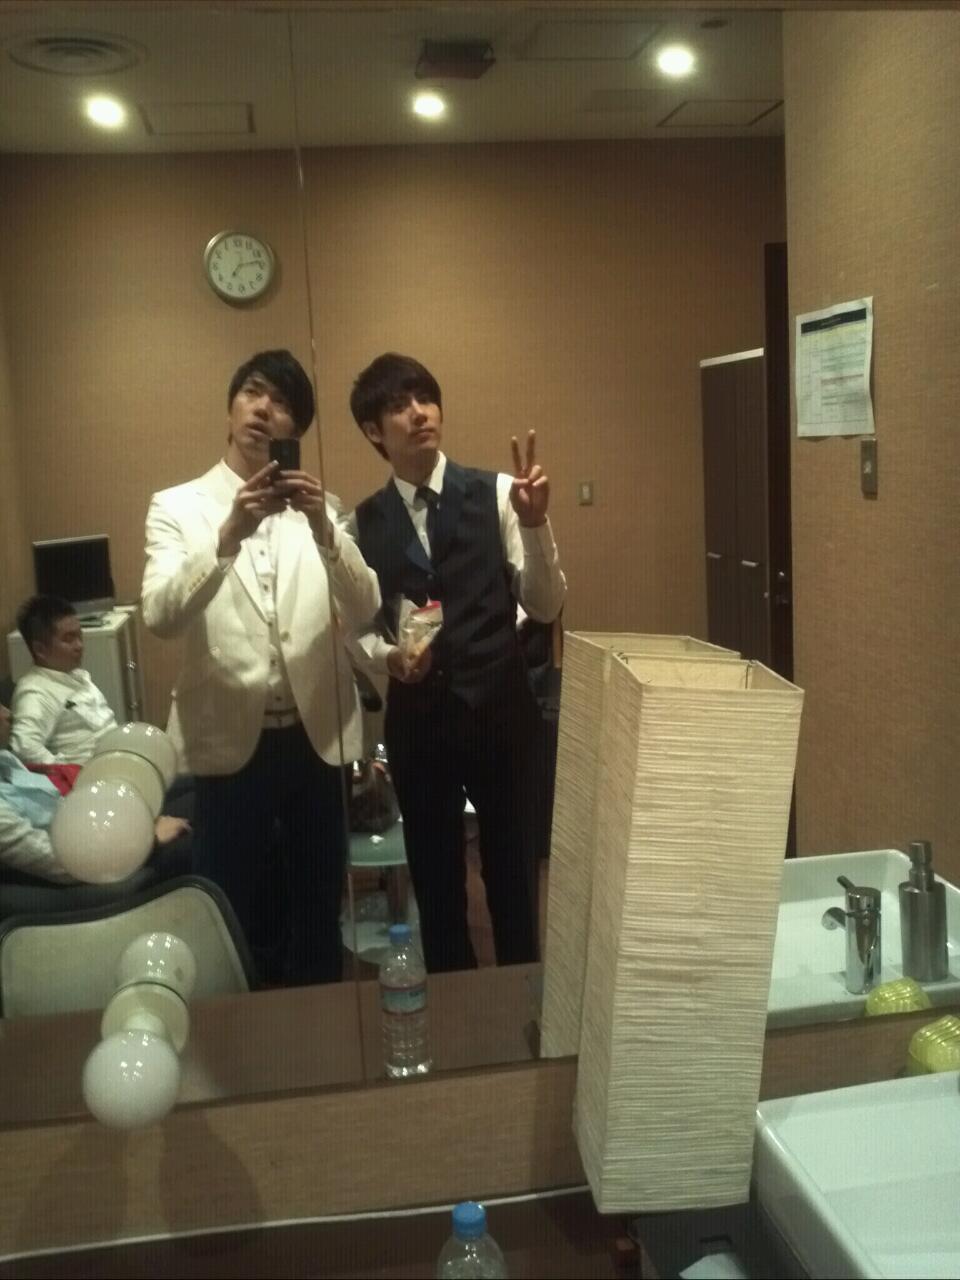 [MUSICAL] 08/04/2011 - KyuJong @ Goong Musical  - Page 2 T72snq11